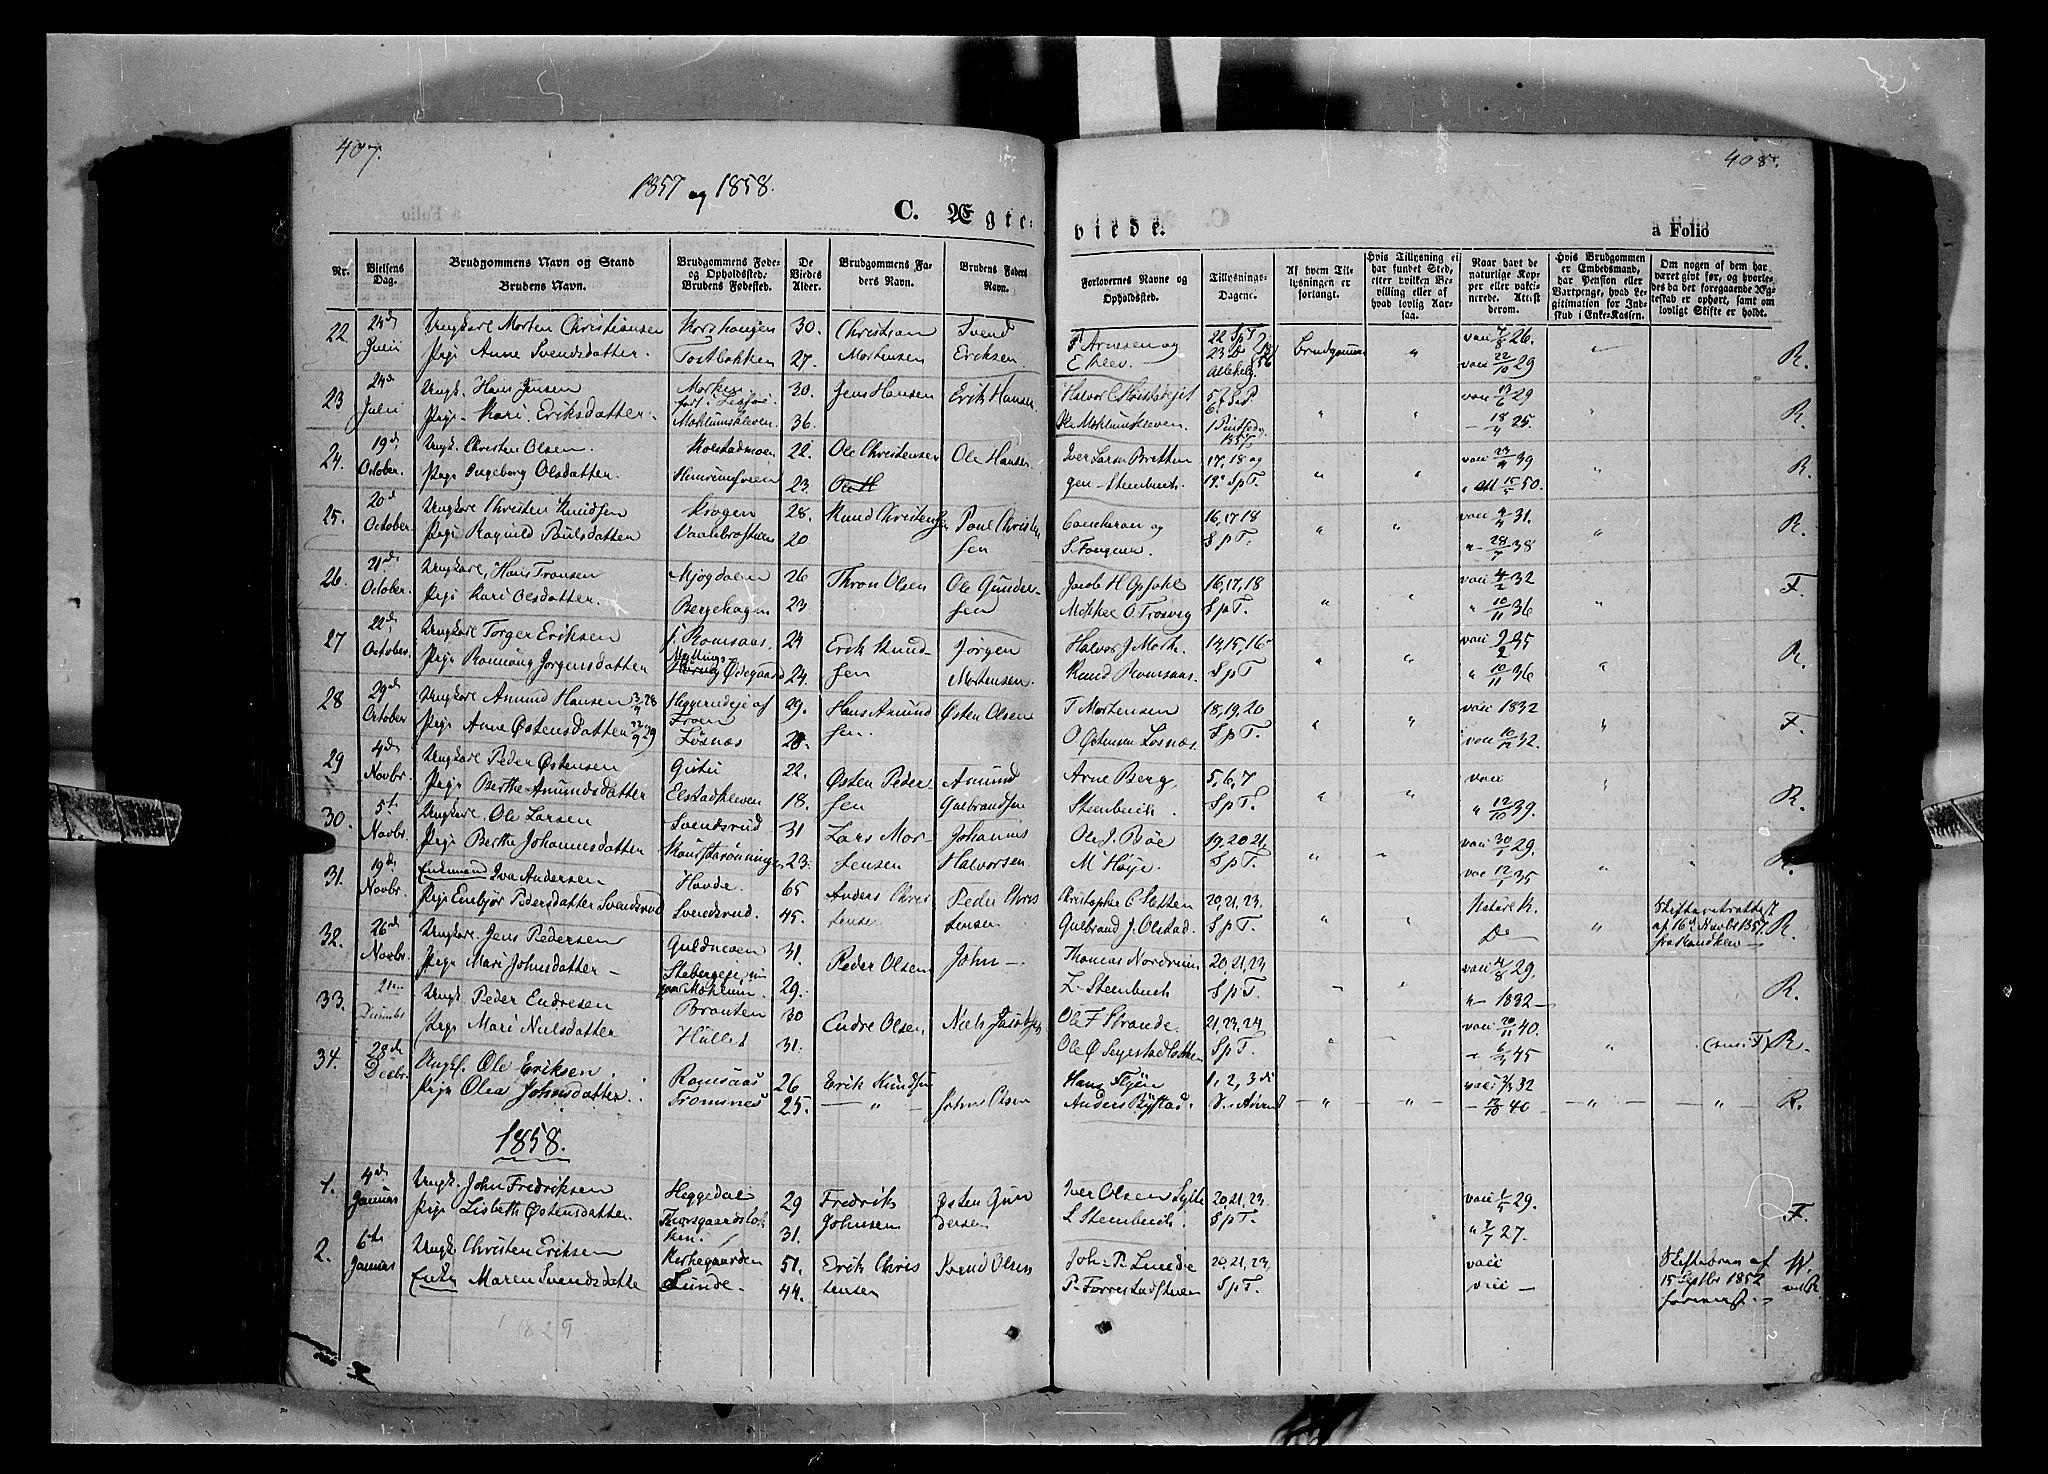 SAH, Ringebu prestekontor, Ministerialbok nr. 6, 1848-1859, s. 407-408